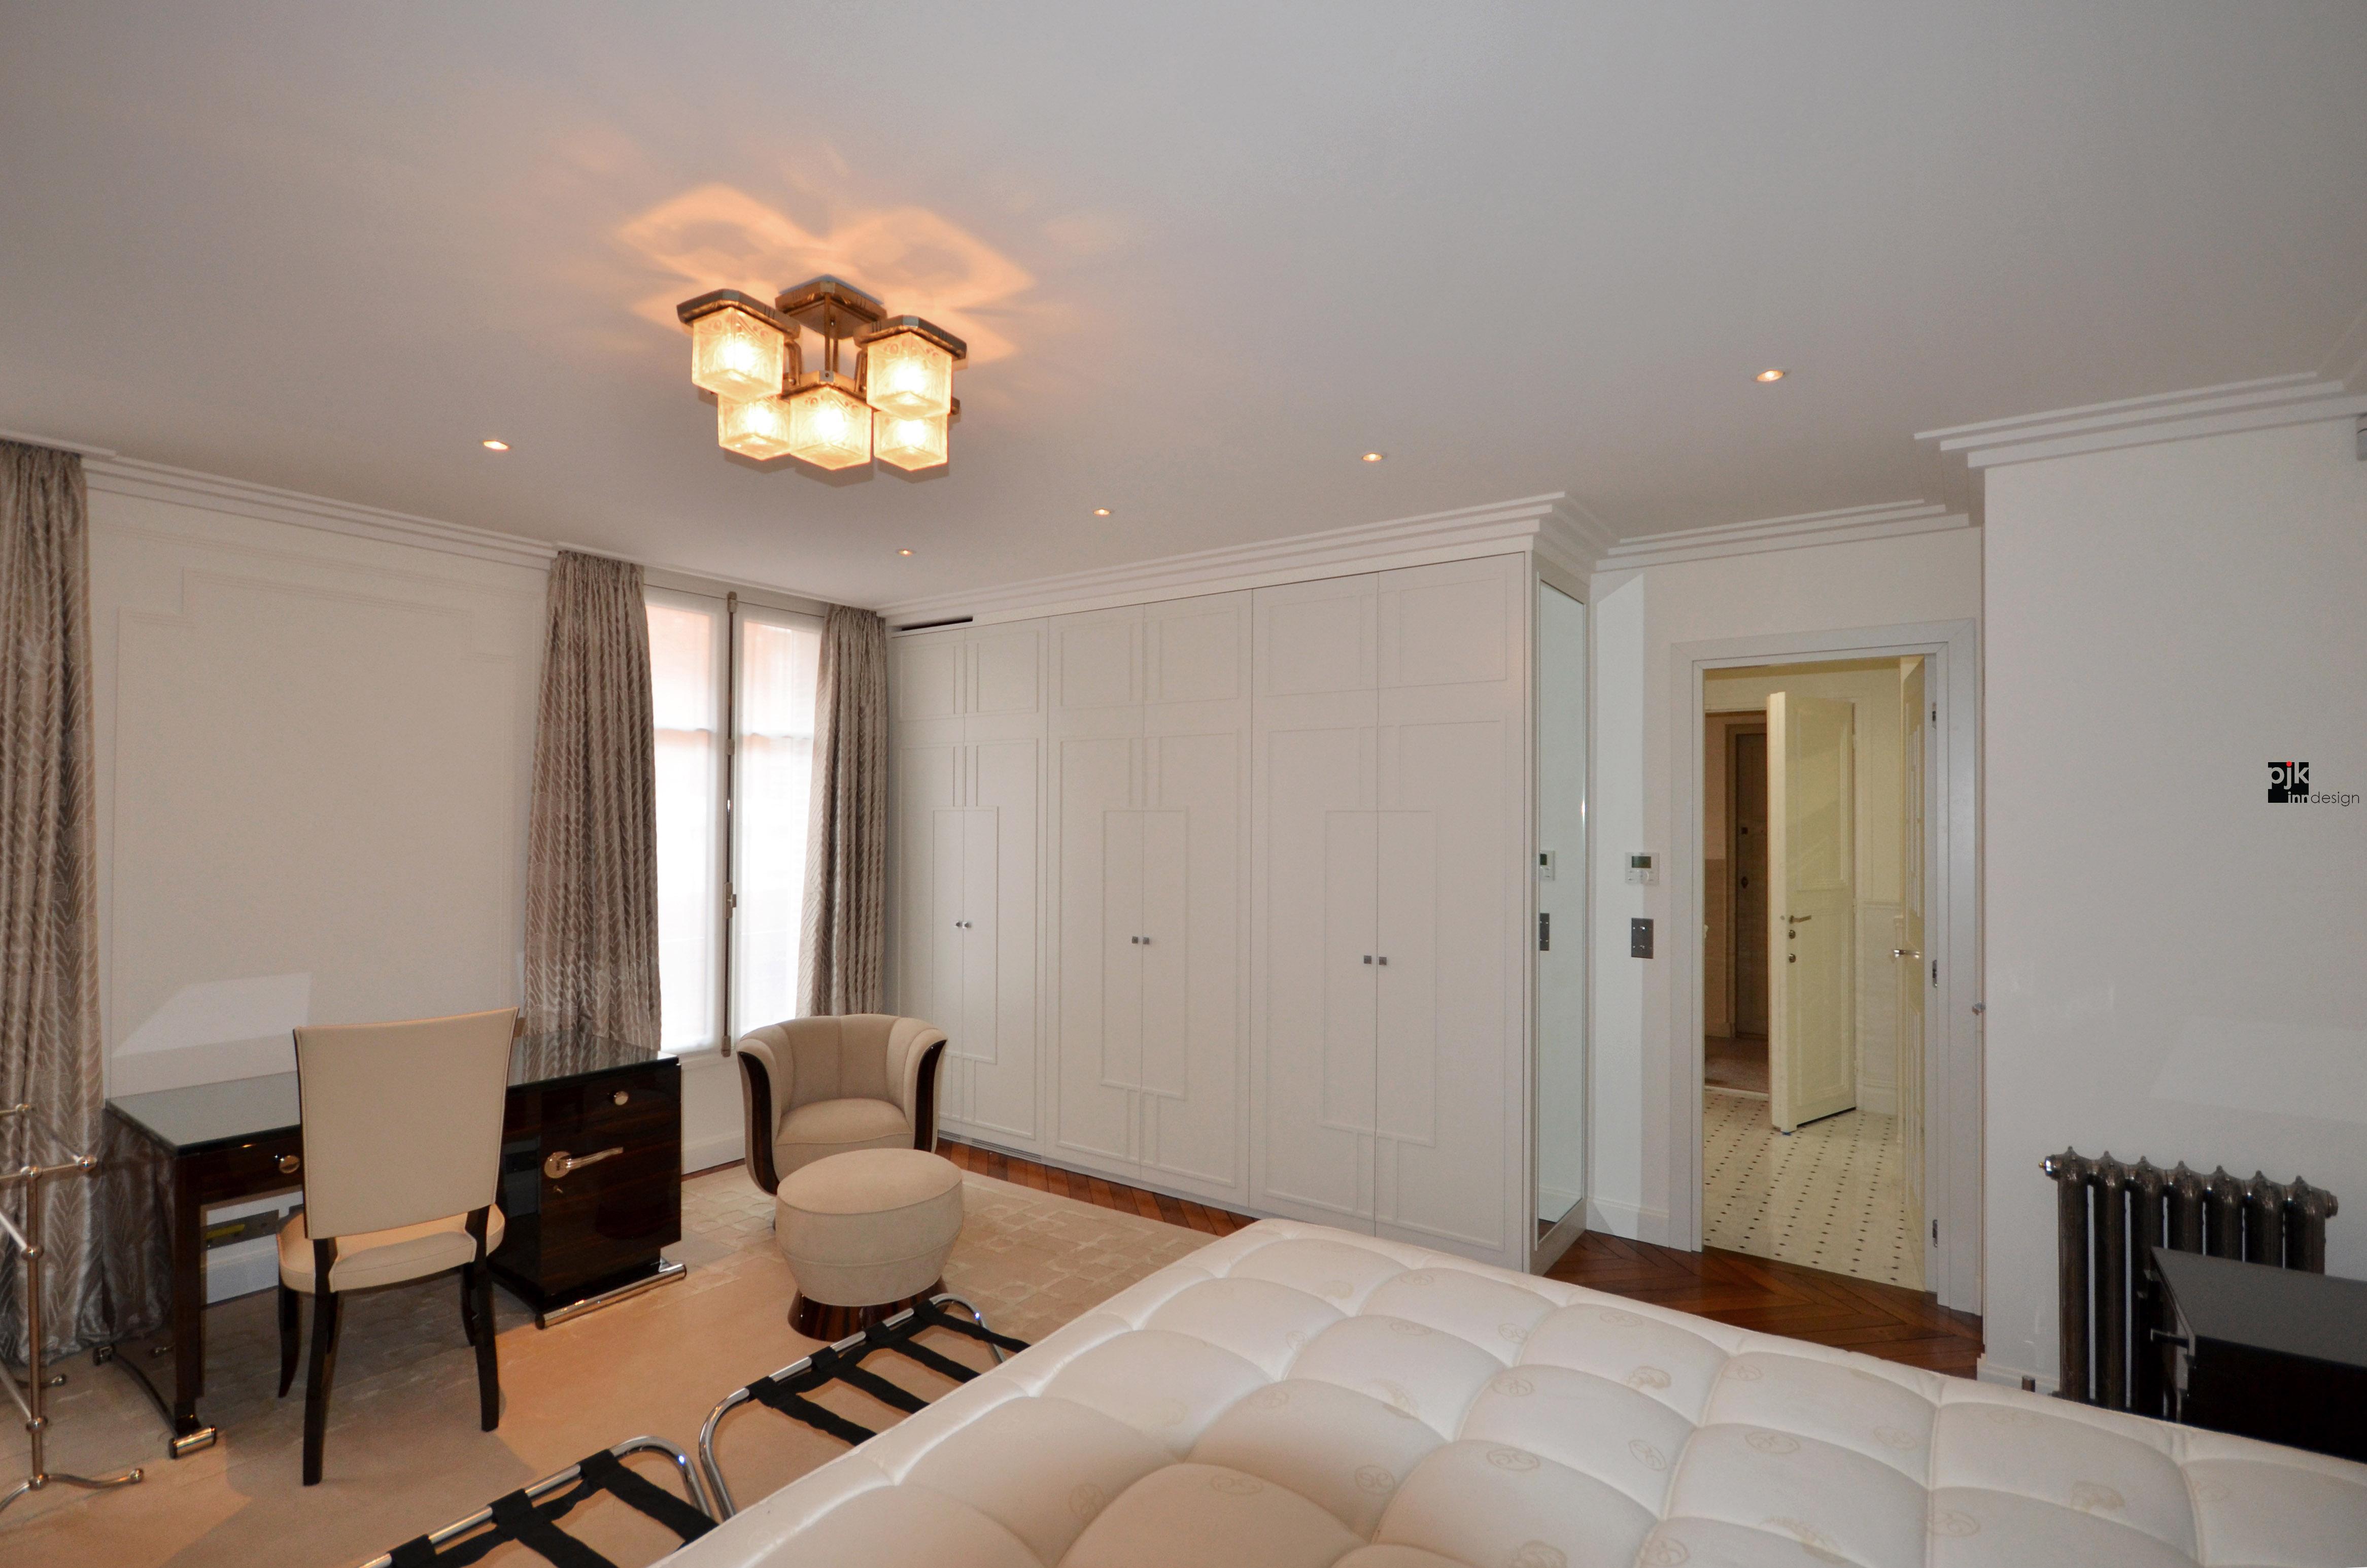 Appartamento Rue du Vieux - Pjk Inndesign